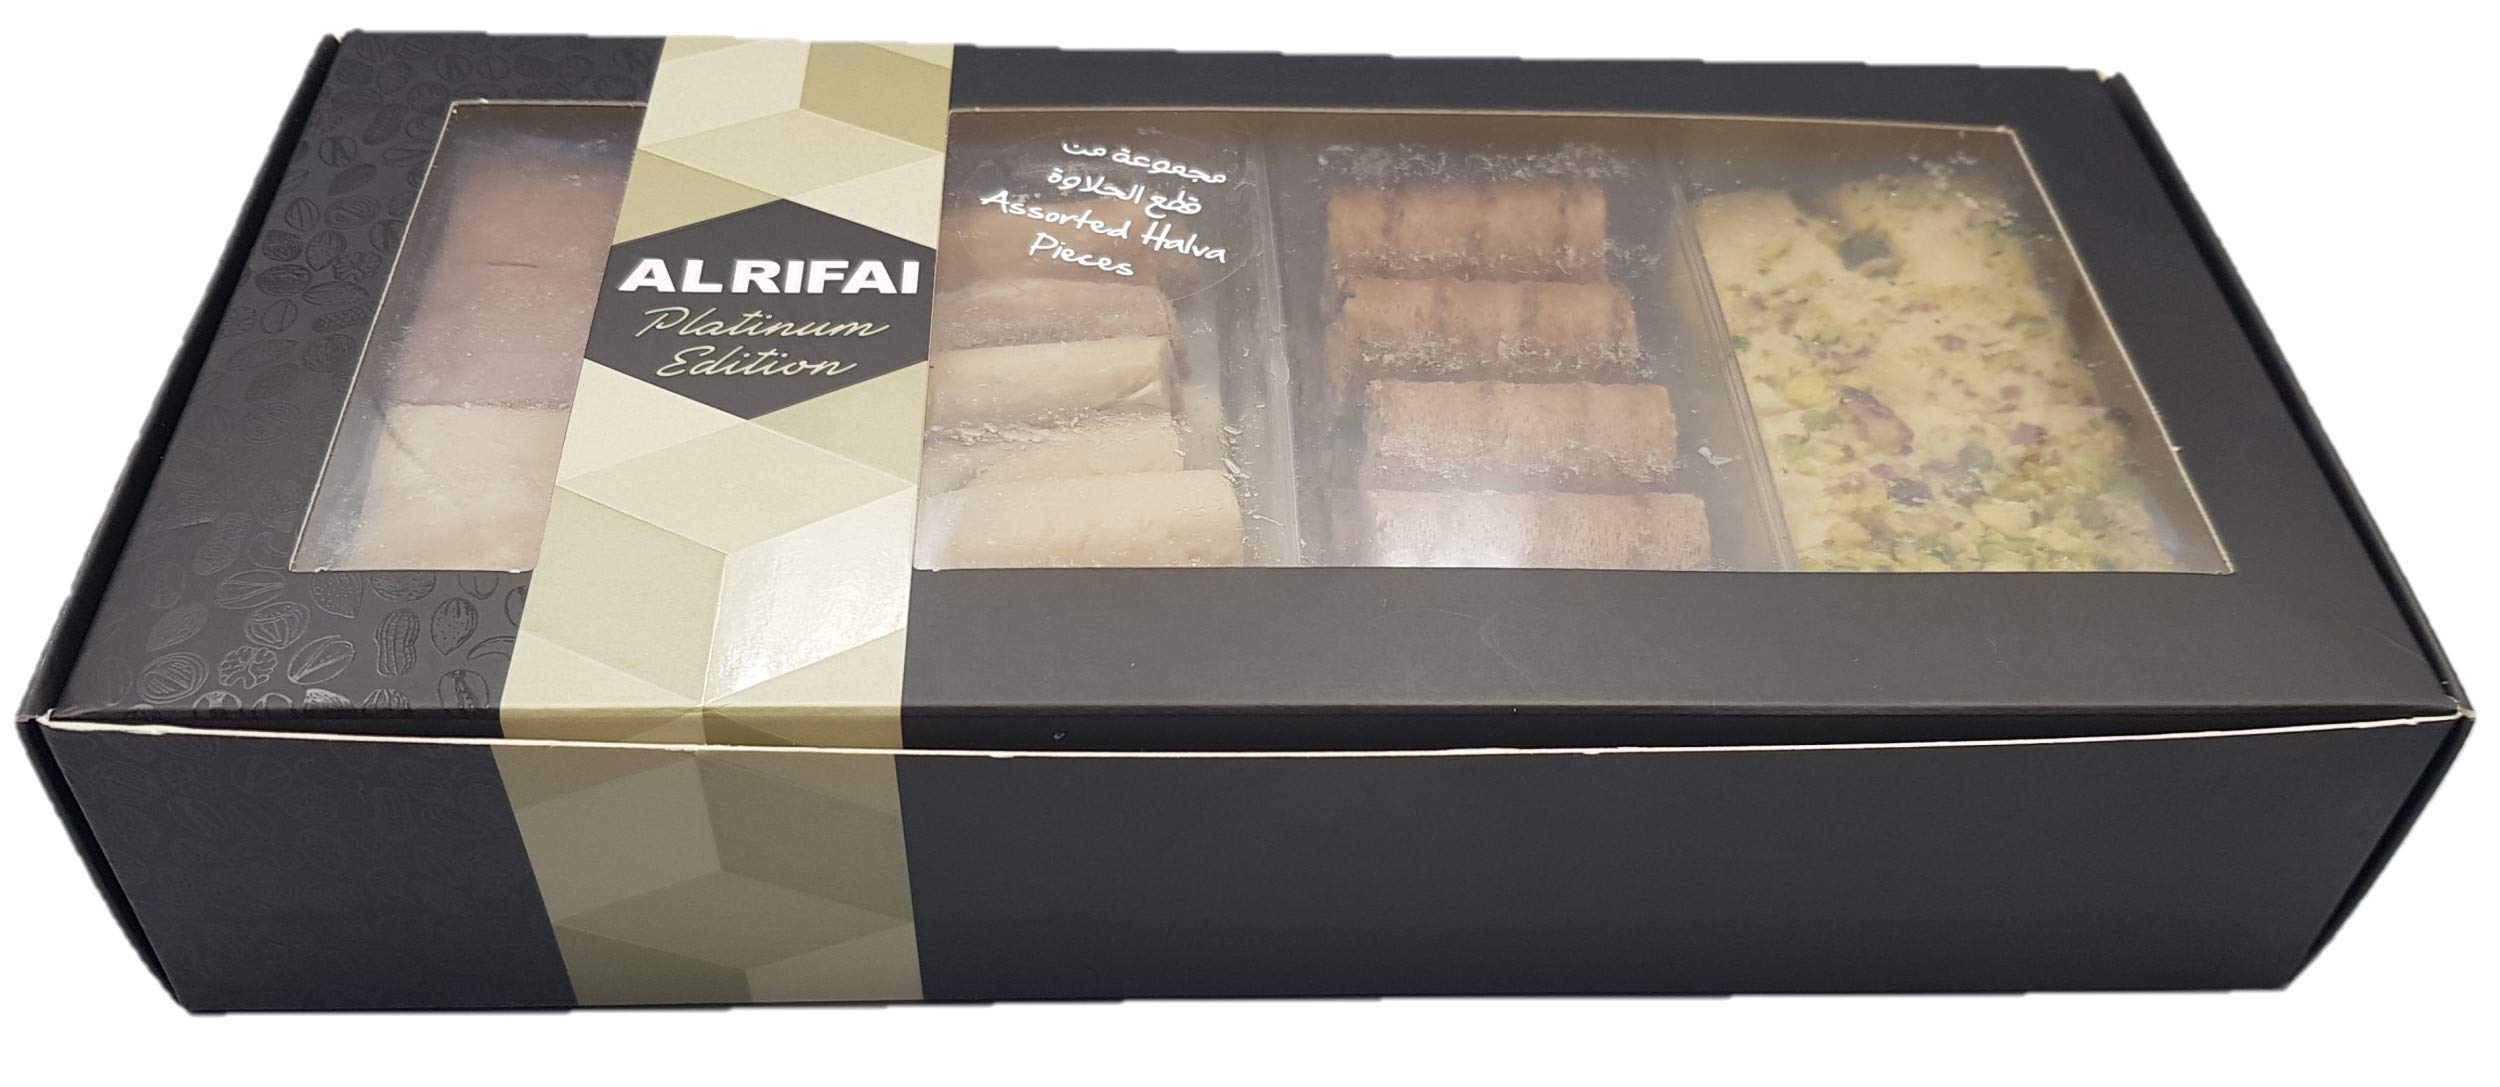 Artisanal Halvah Bars Assorted - 5 Varieties: Pistachio, Marble & Plain - Tahini Halvah Bars (1.8 lbs, 30 Oz, 800 Grams NET, 85-90 Pcs, 4 Layers) Halawa - Flaky Turkish Halva Very Classy Box by Turkish Delight (Image #6)